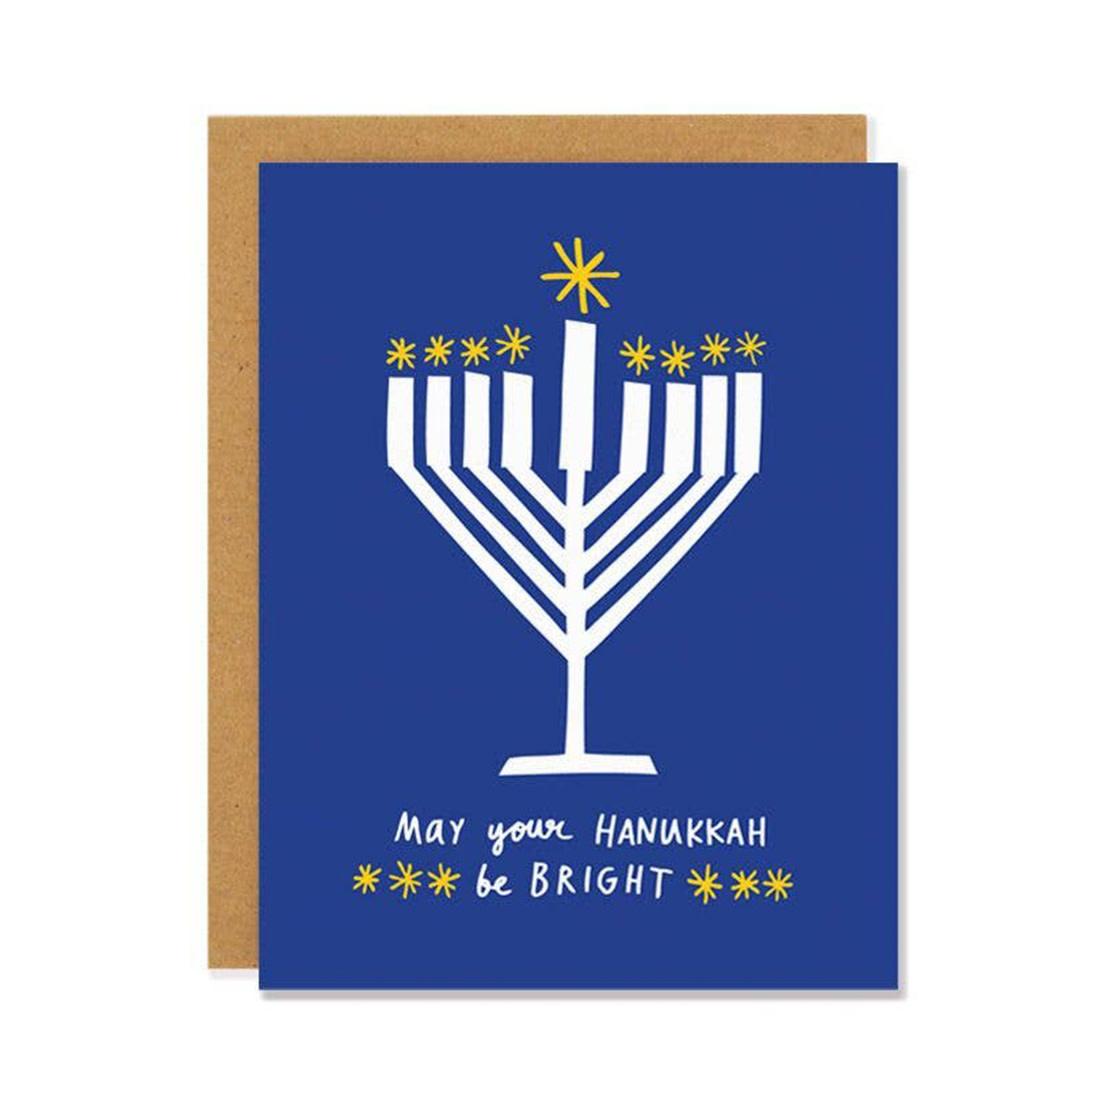 BADGER & BURKE Hanukkah Be Bright Card